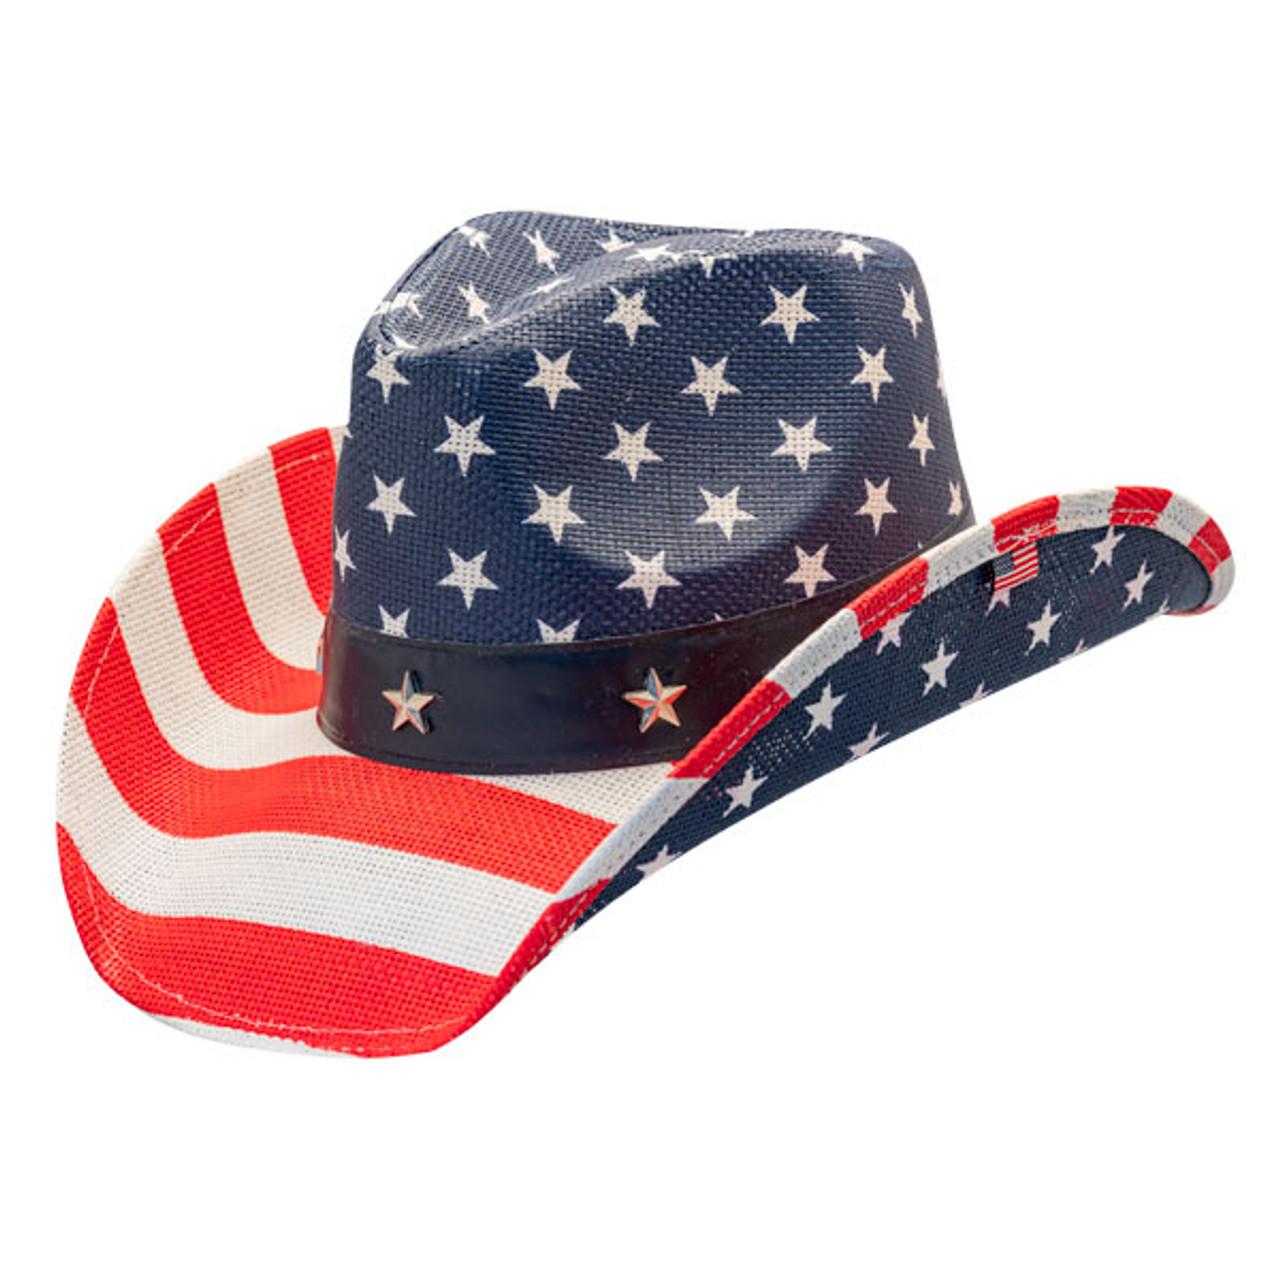 7579c8b0 California Hat Company | American Flag Cowboy Hat | Hats Unlimited